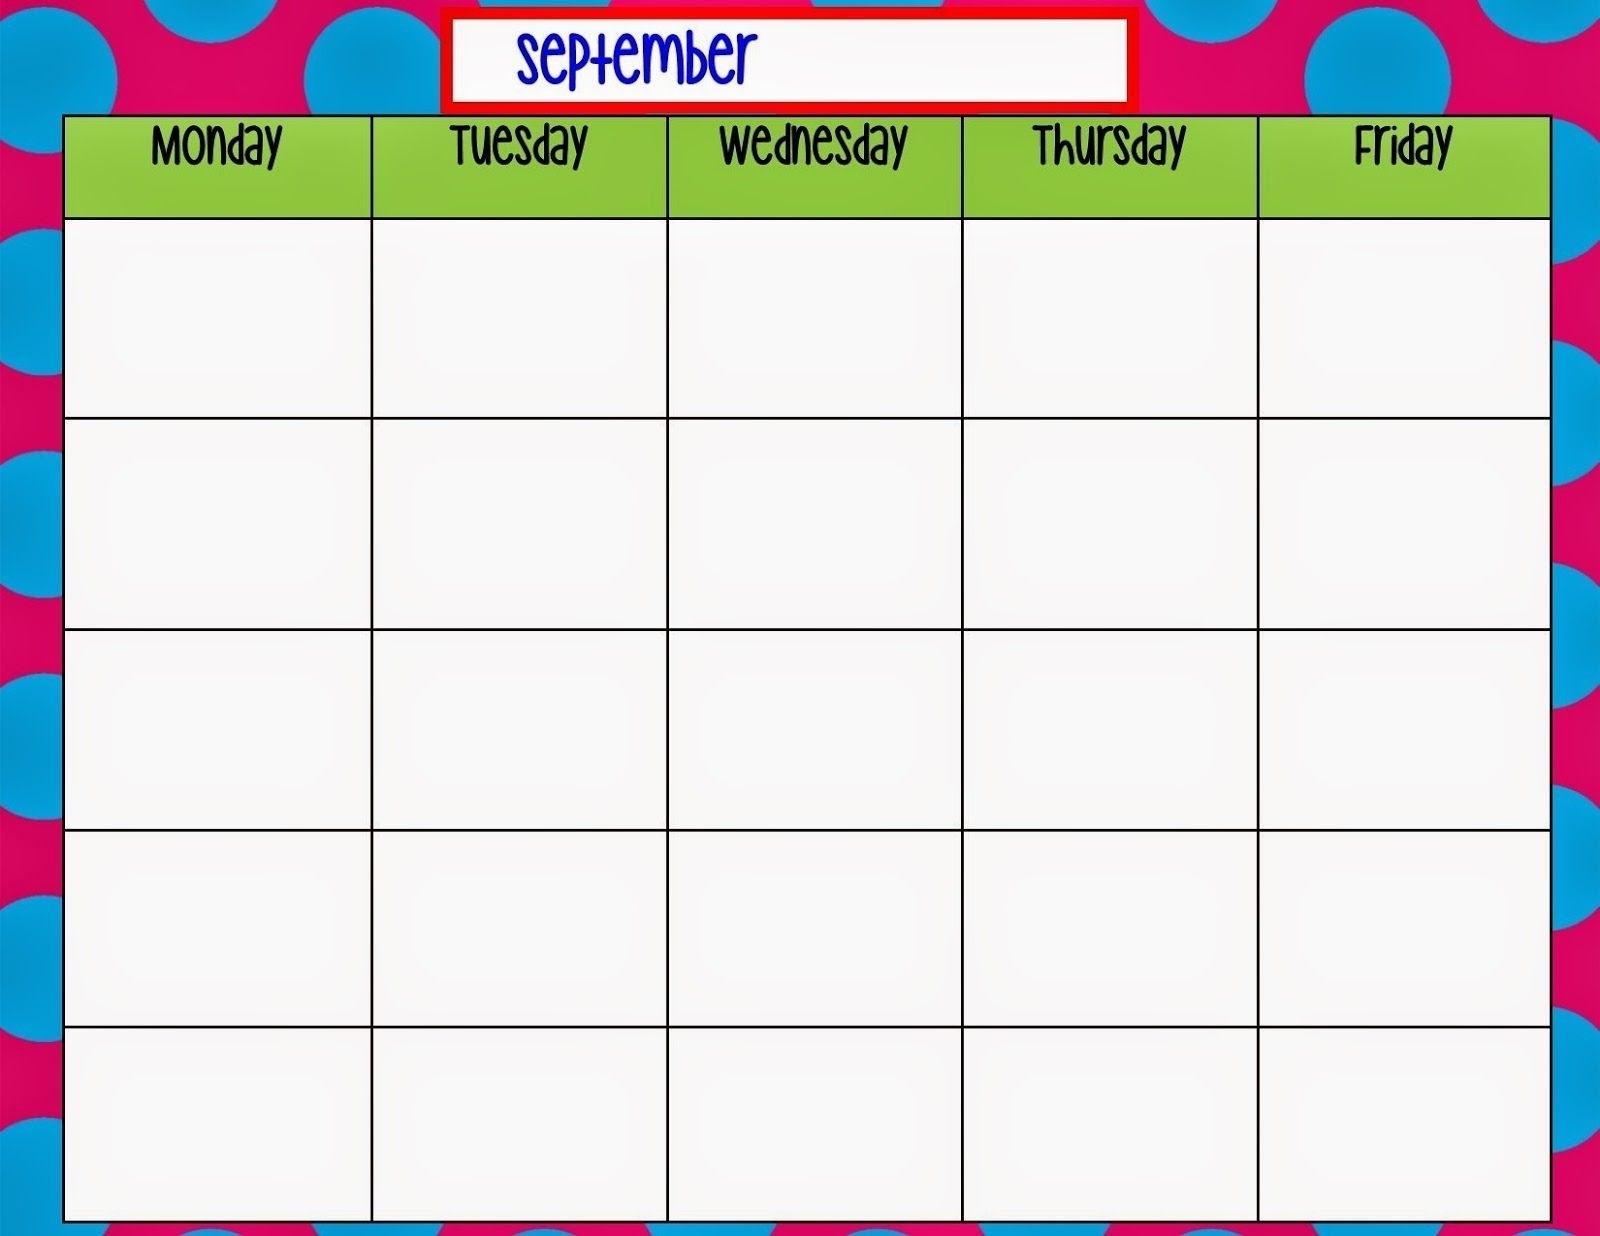 Mon Thru Friday Weekly Blank Calendar | Calendar Template